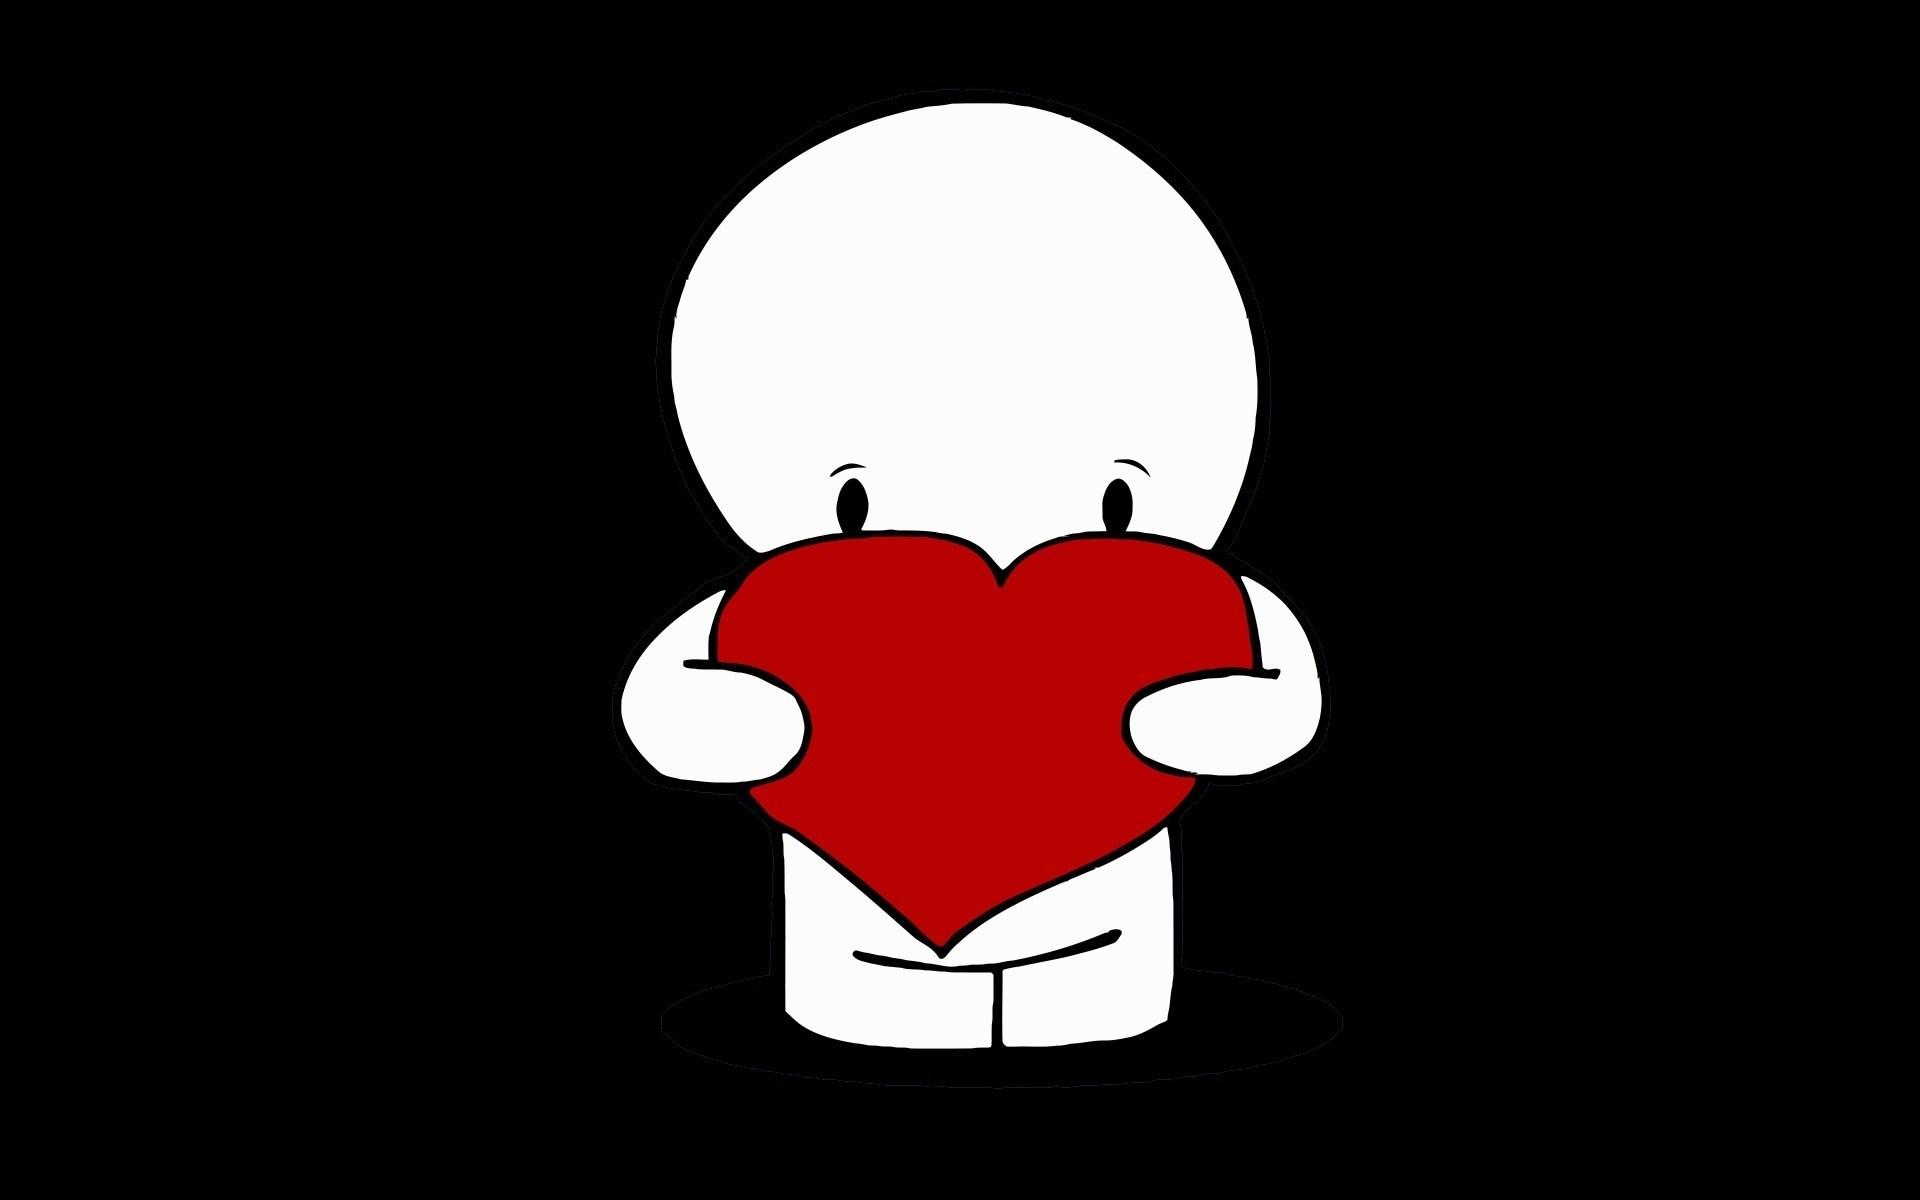 Red Heart Creative